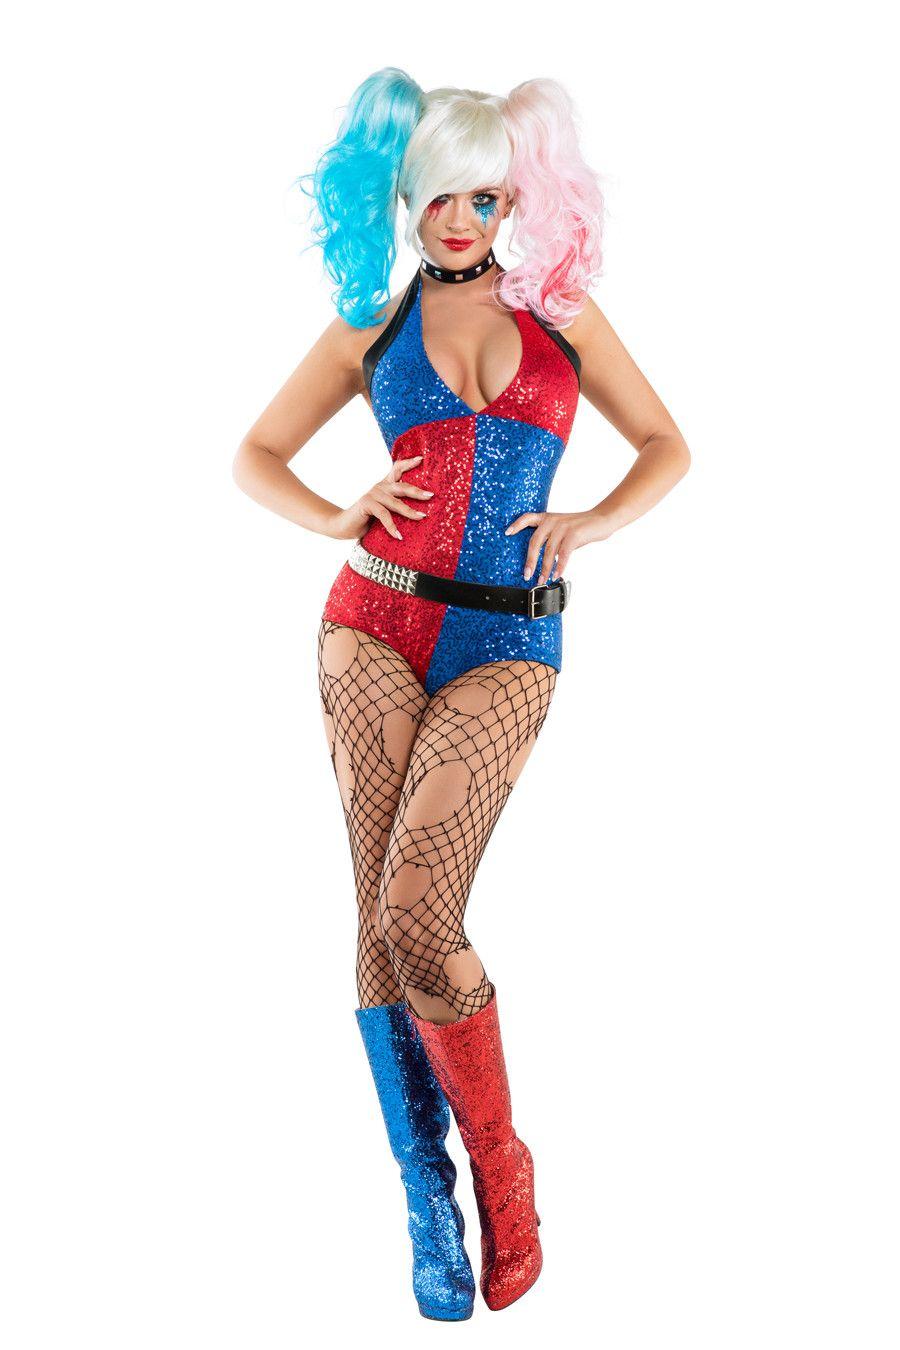 harley quinn costume from suicide squad sexy superhero villain woman costume joker halloween - Joker Halloween Costume For Females